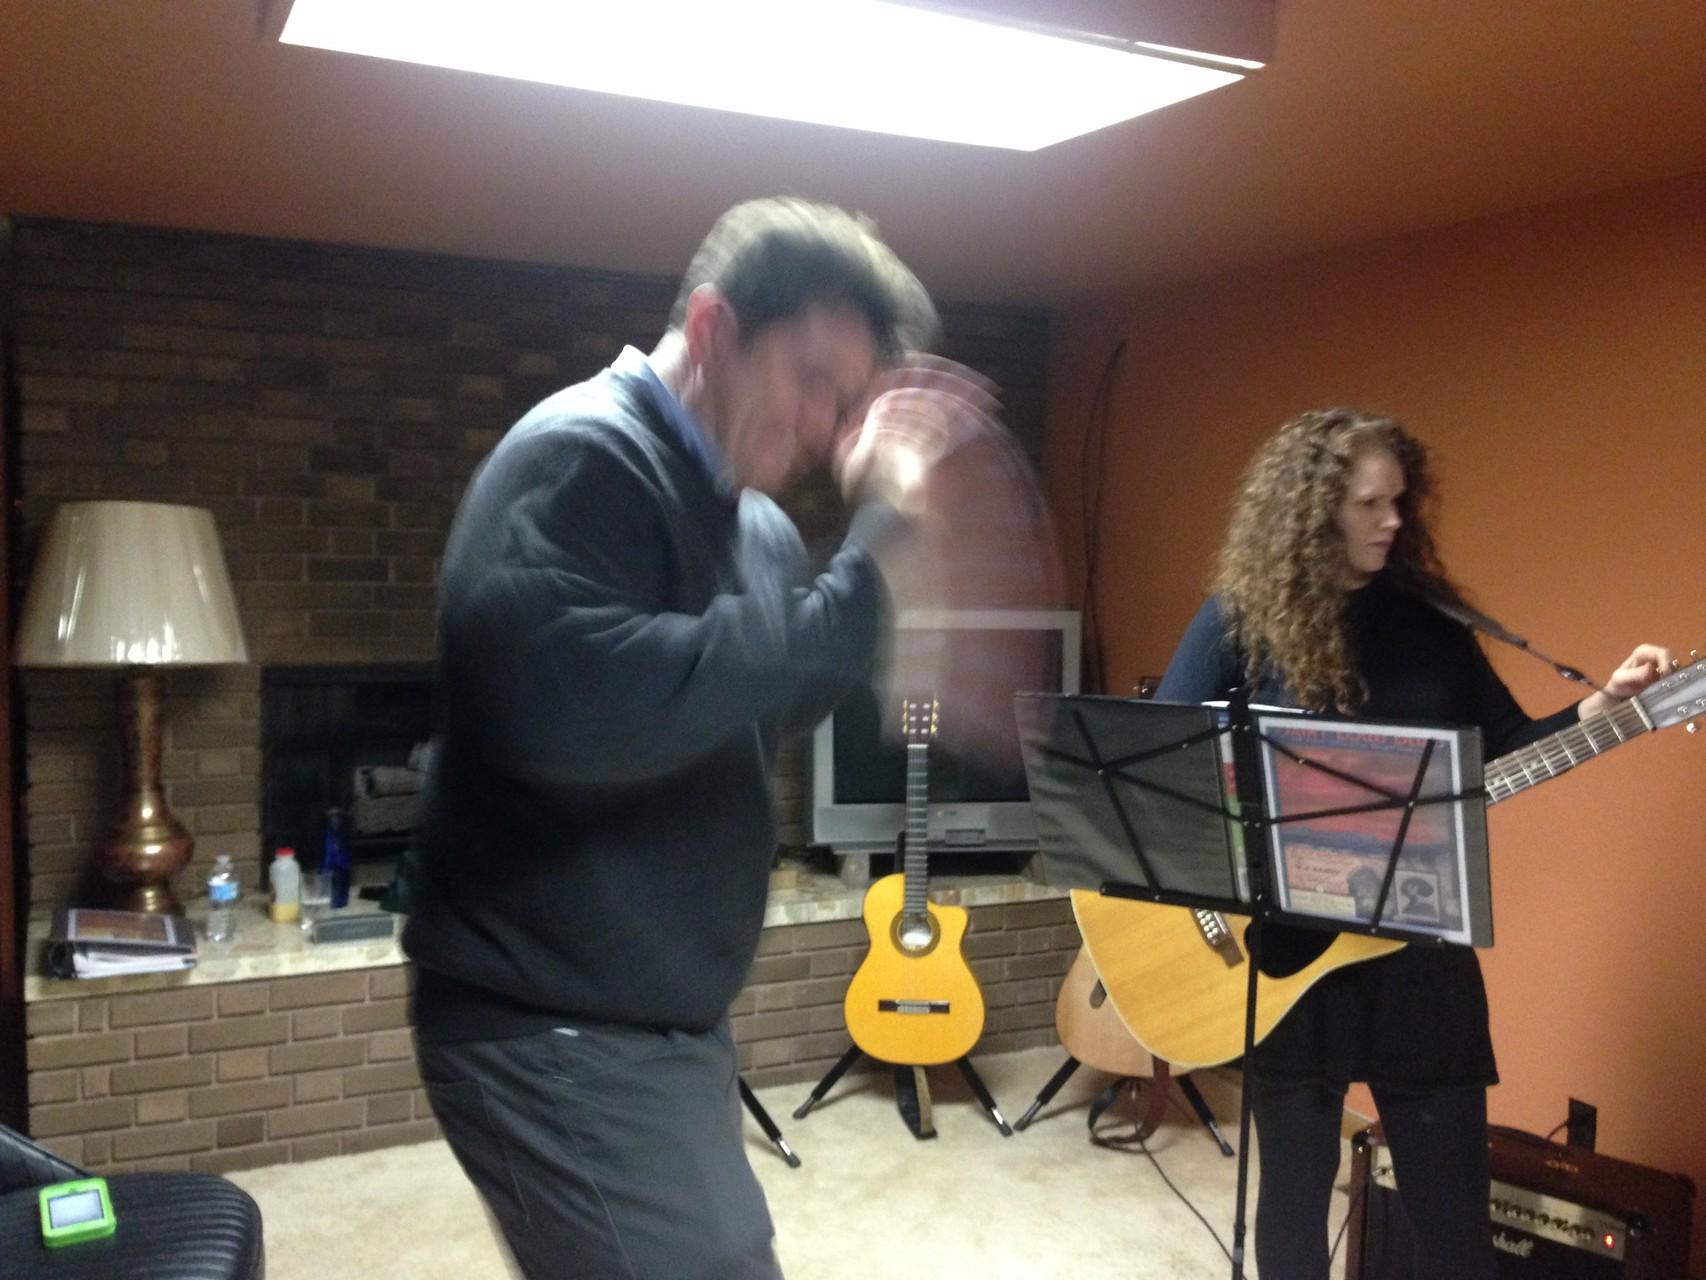 John warming up for the bongos